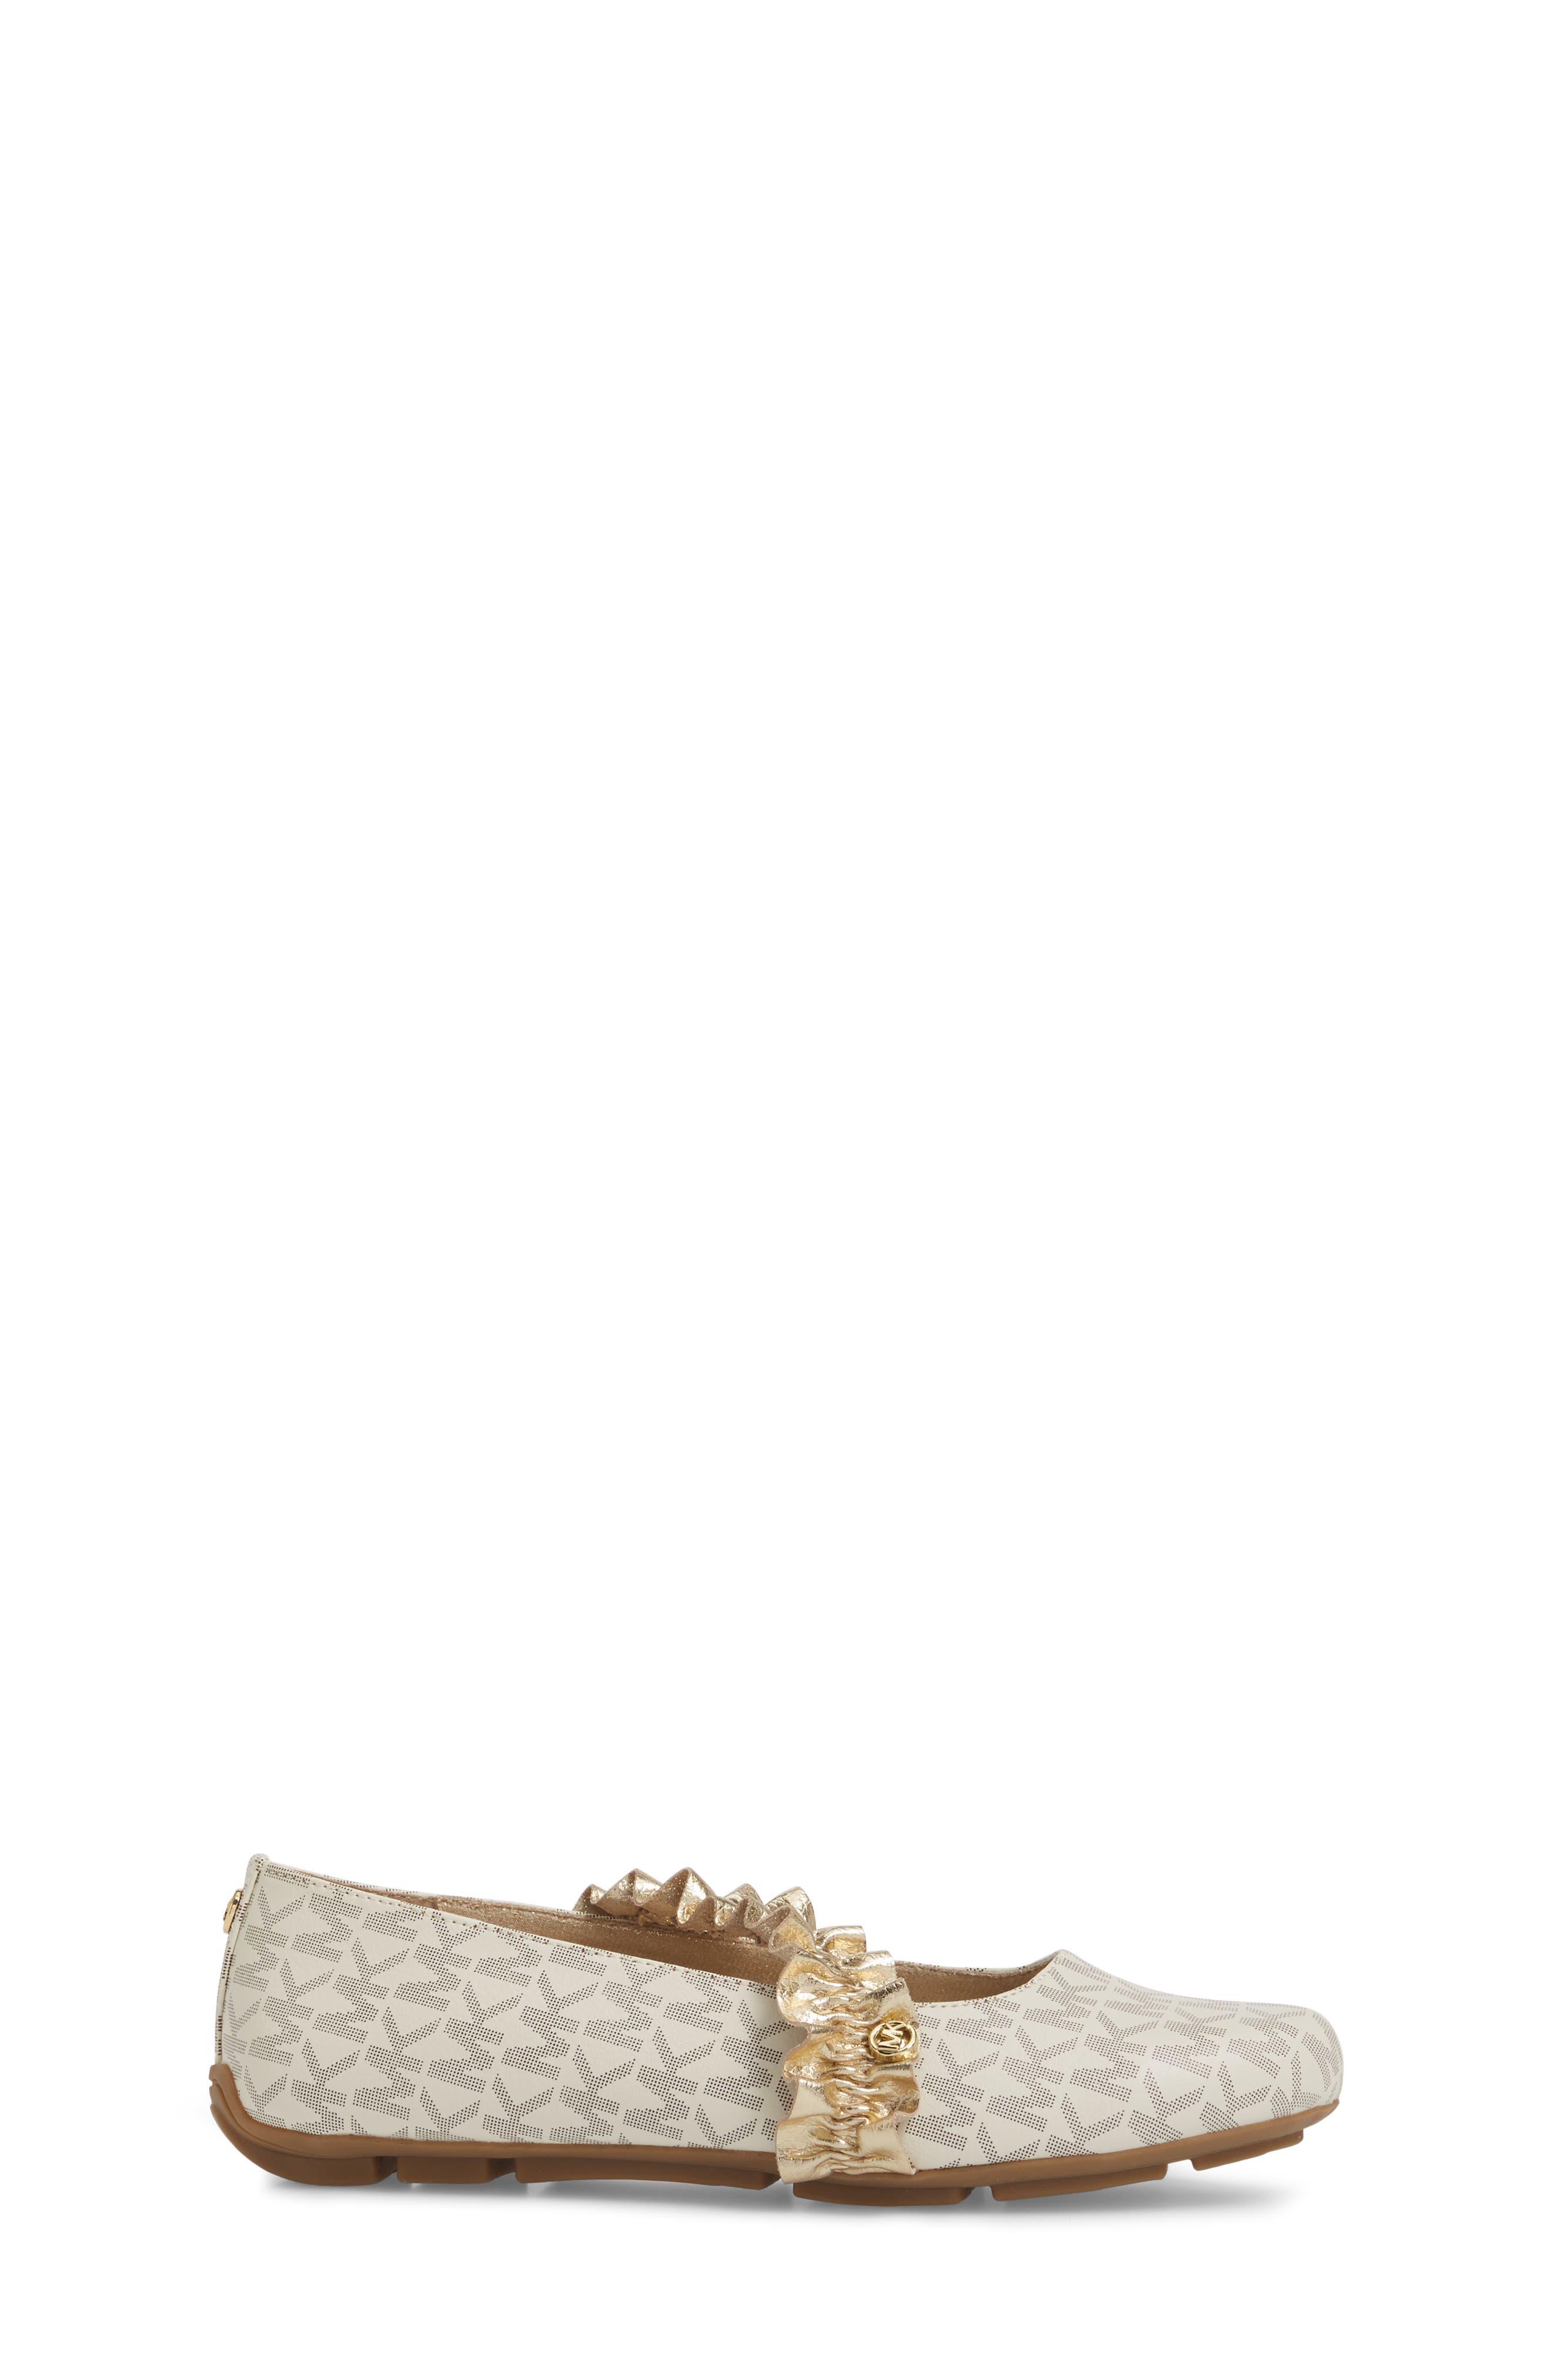 Rover Ruff Mary Jane Flat,                             Alternate thumbnail 3, color,                             Vanilla